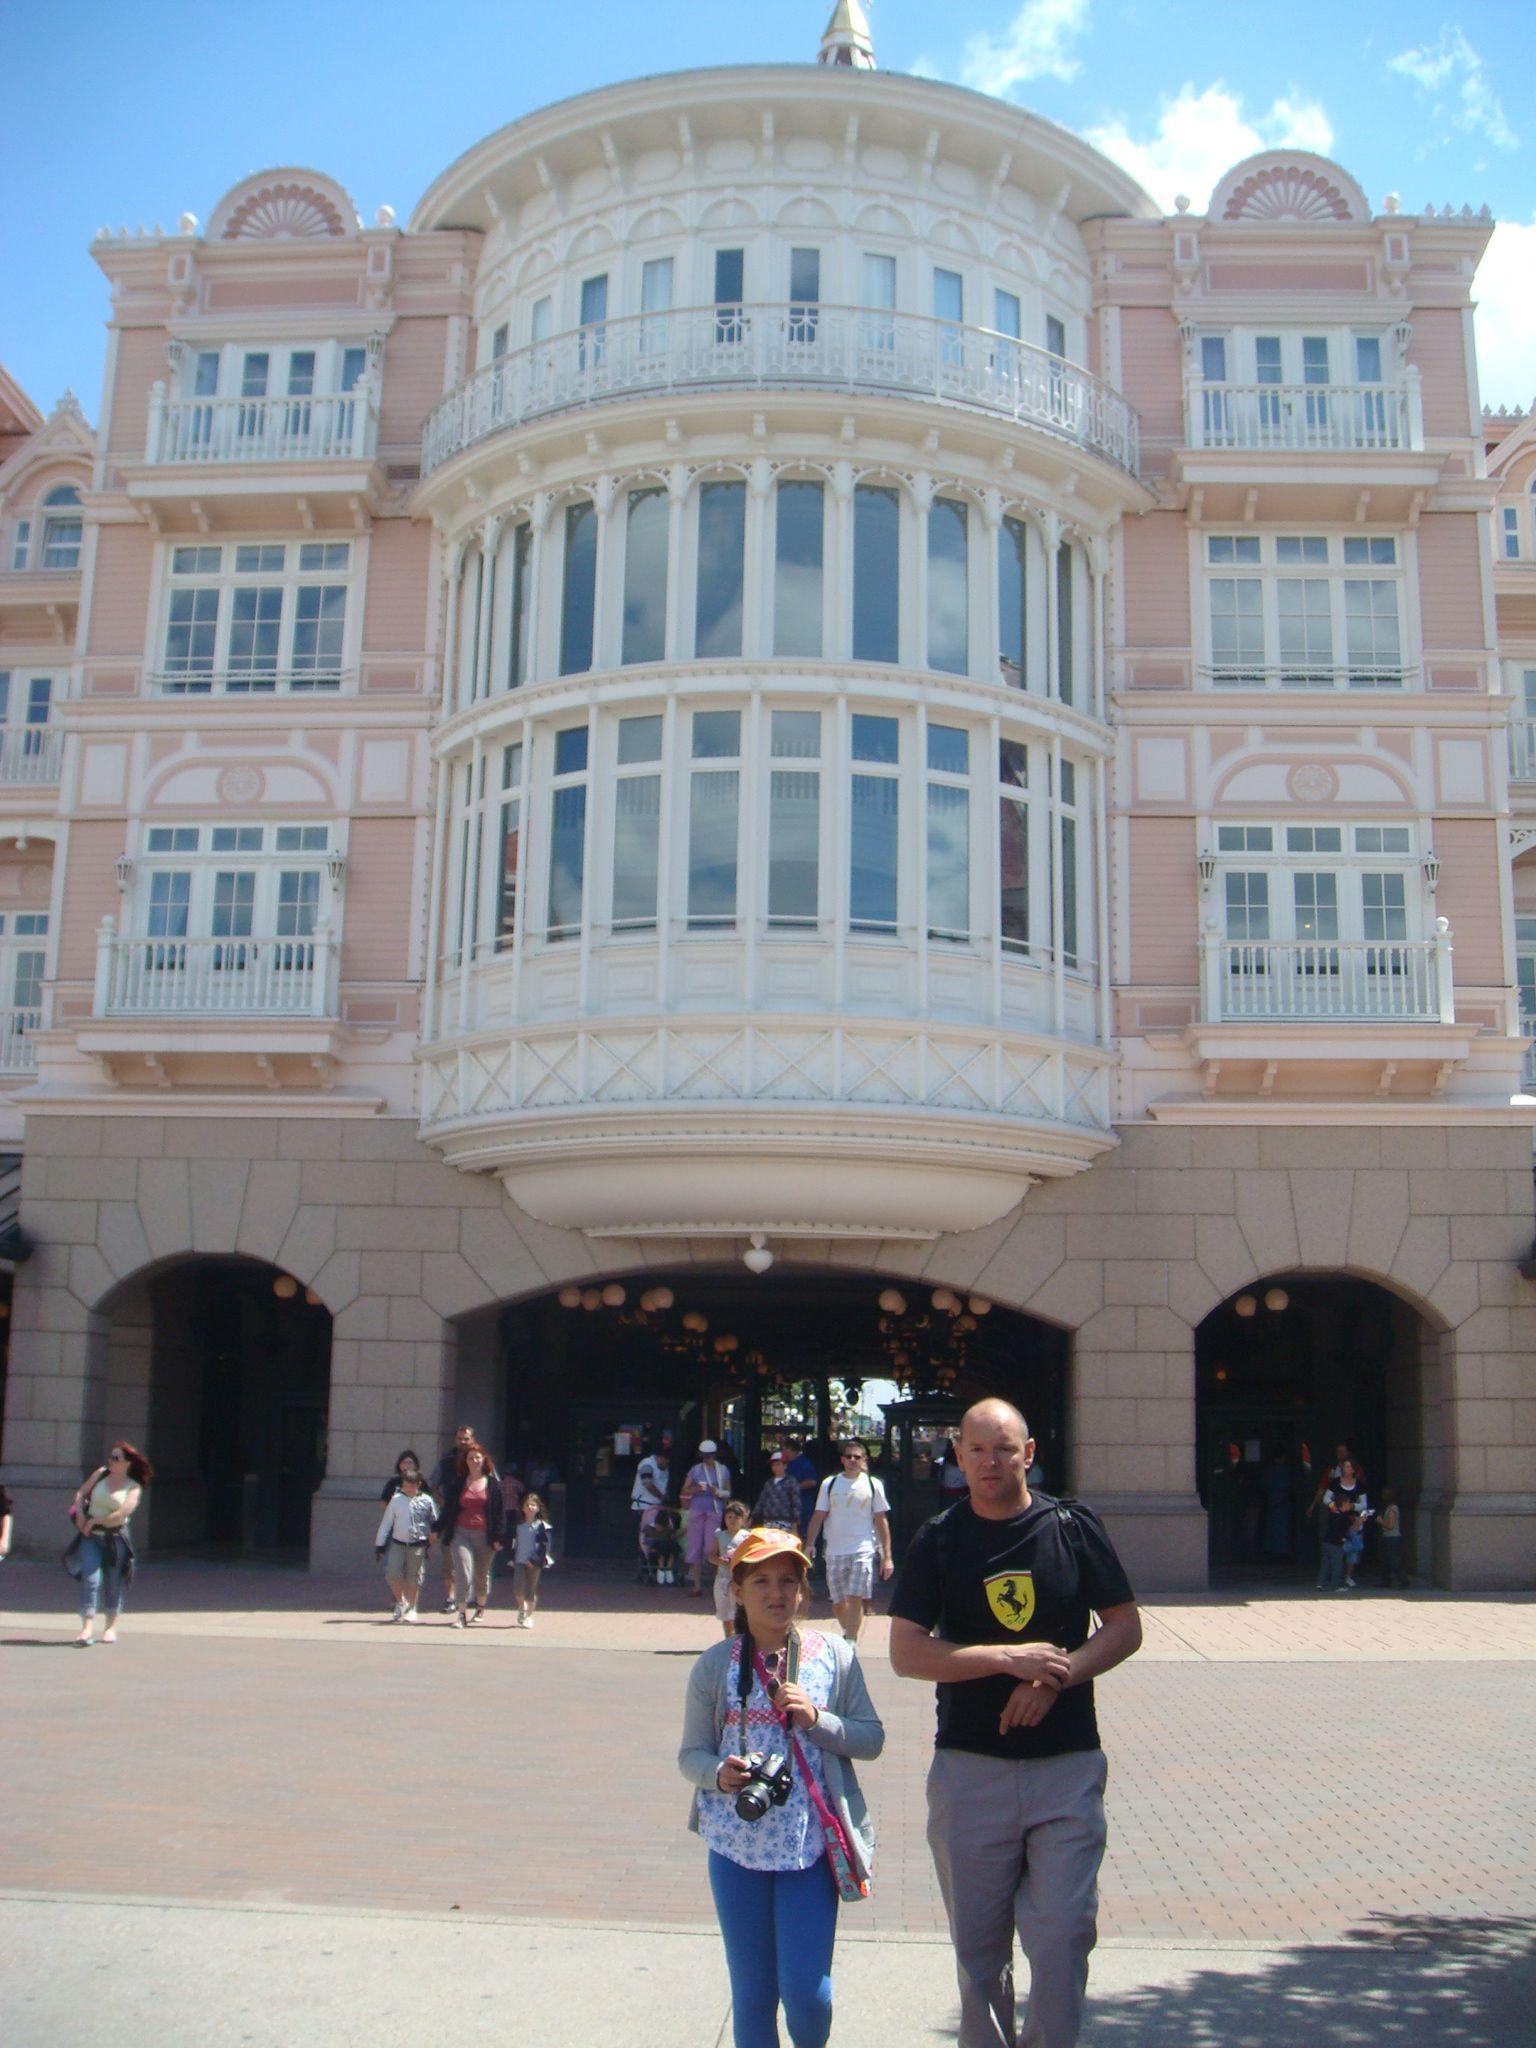 Hotel Deals Http Hotelsnearme Blo Hotels Near Disneyland Disney World Hershey Park Foxwoods